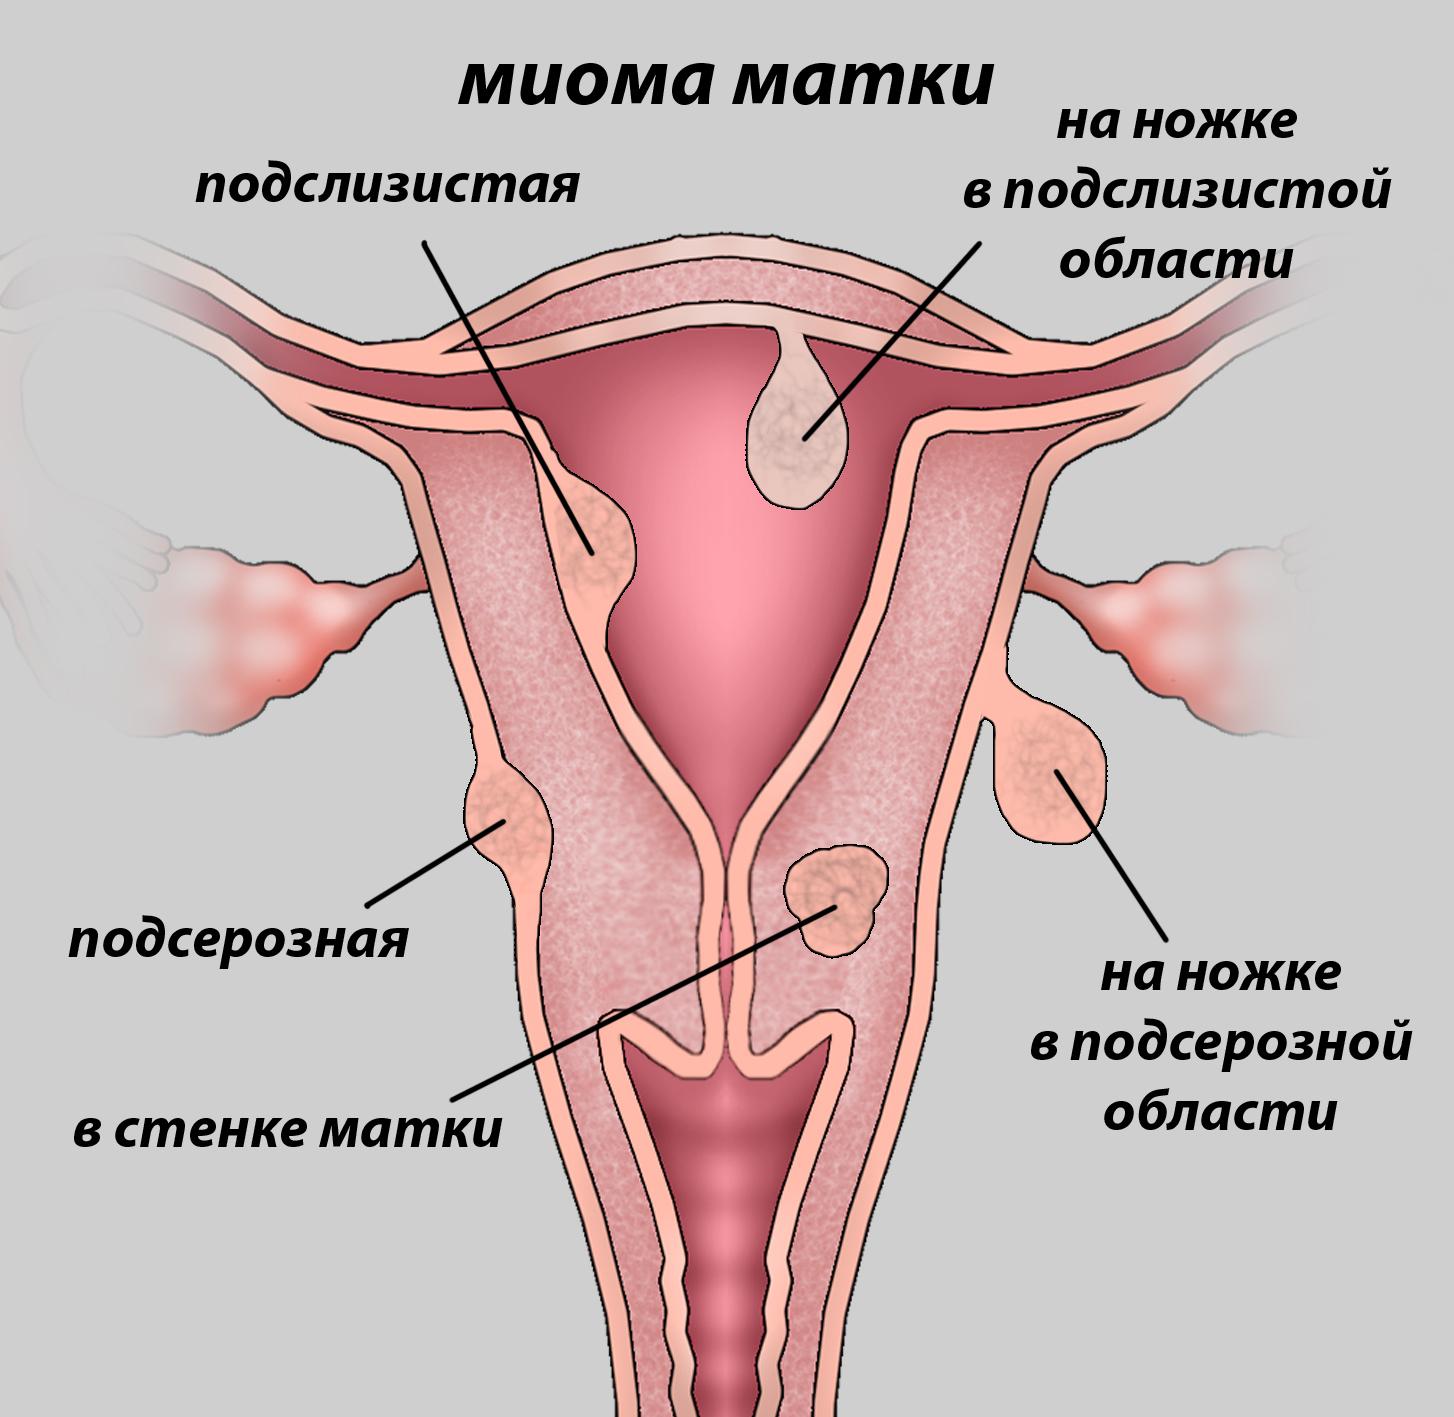 миома матки 2